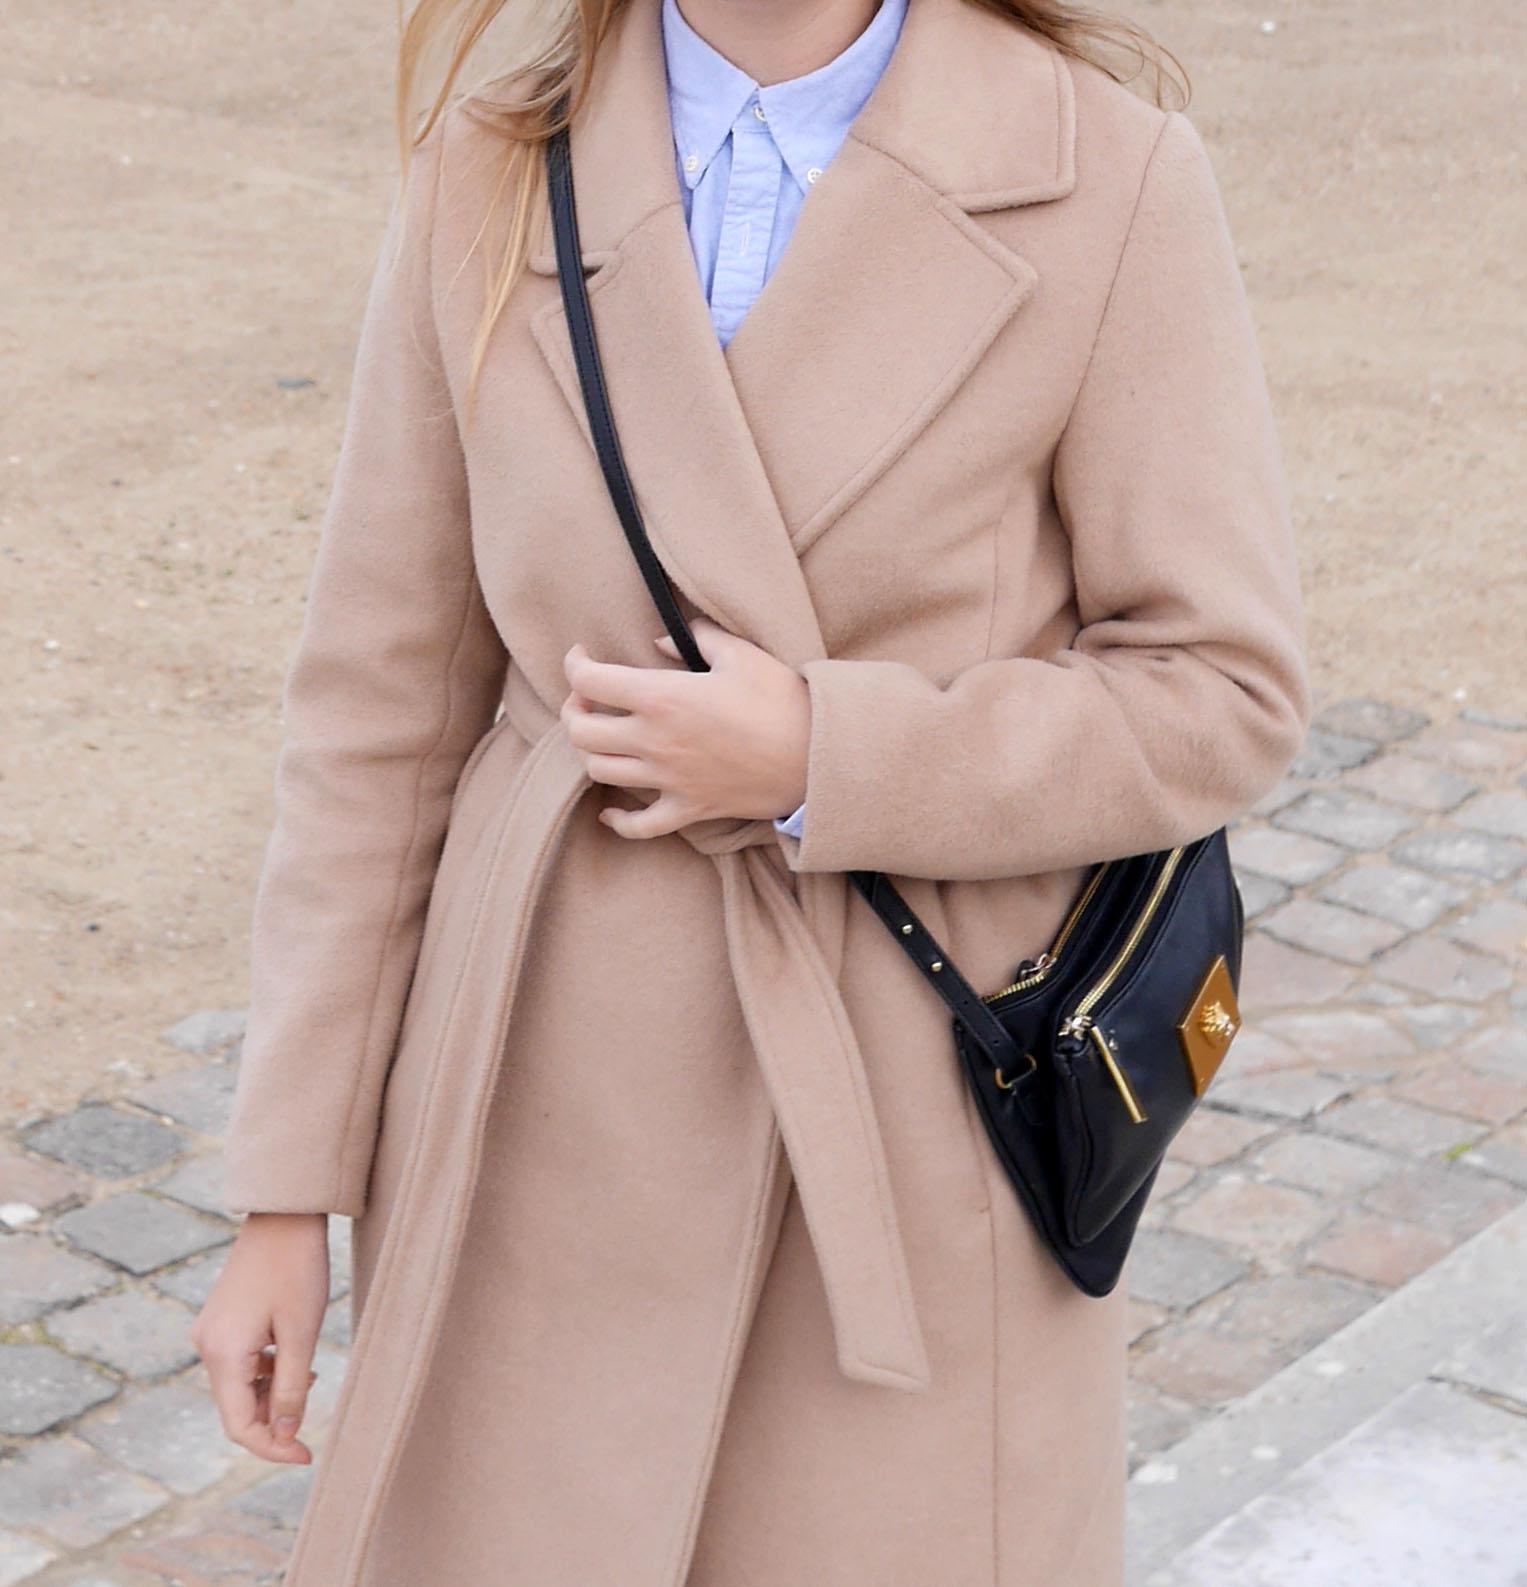 camel_coat_outfit_versailles